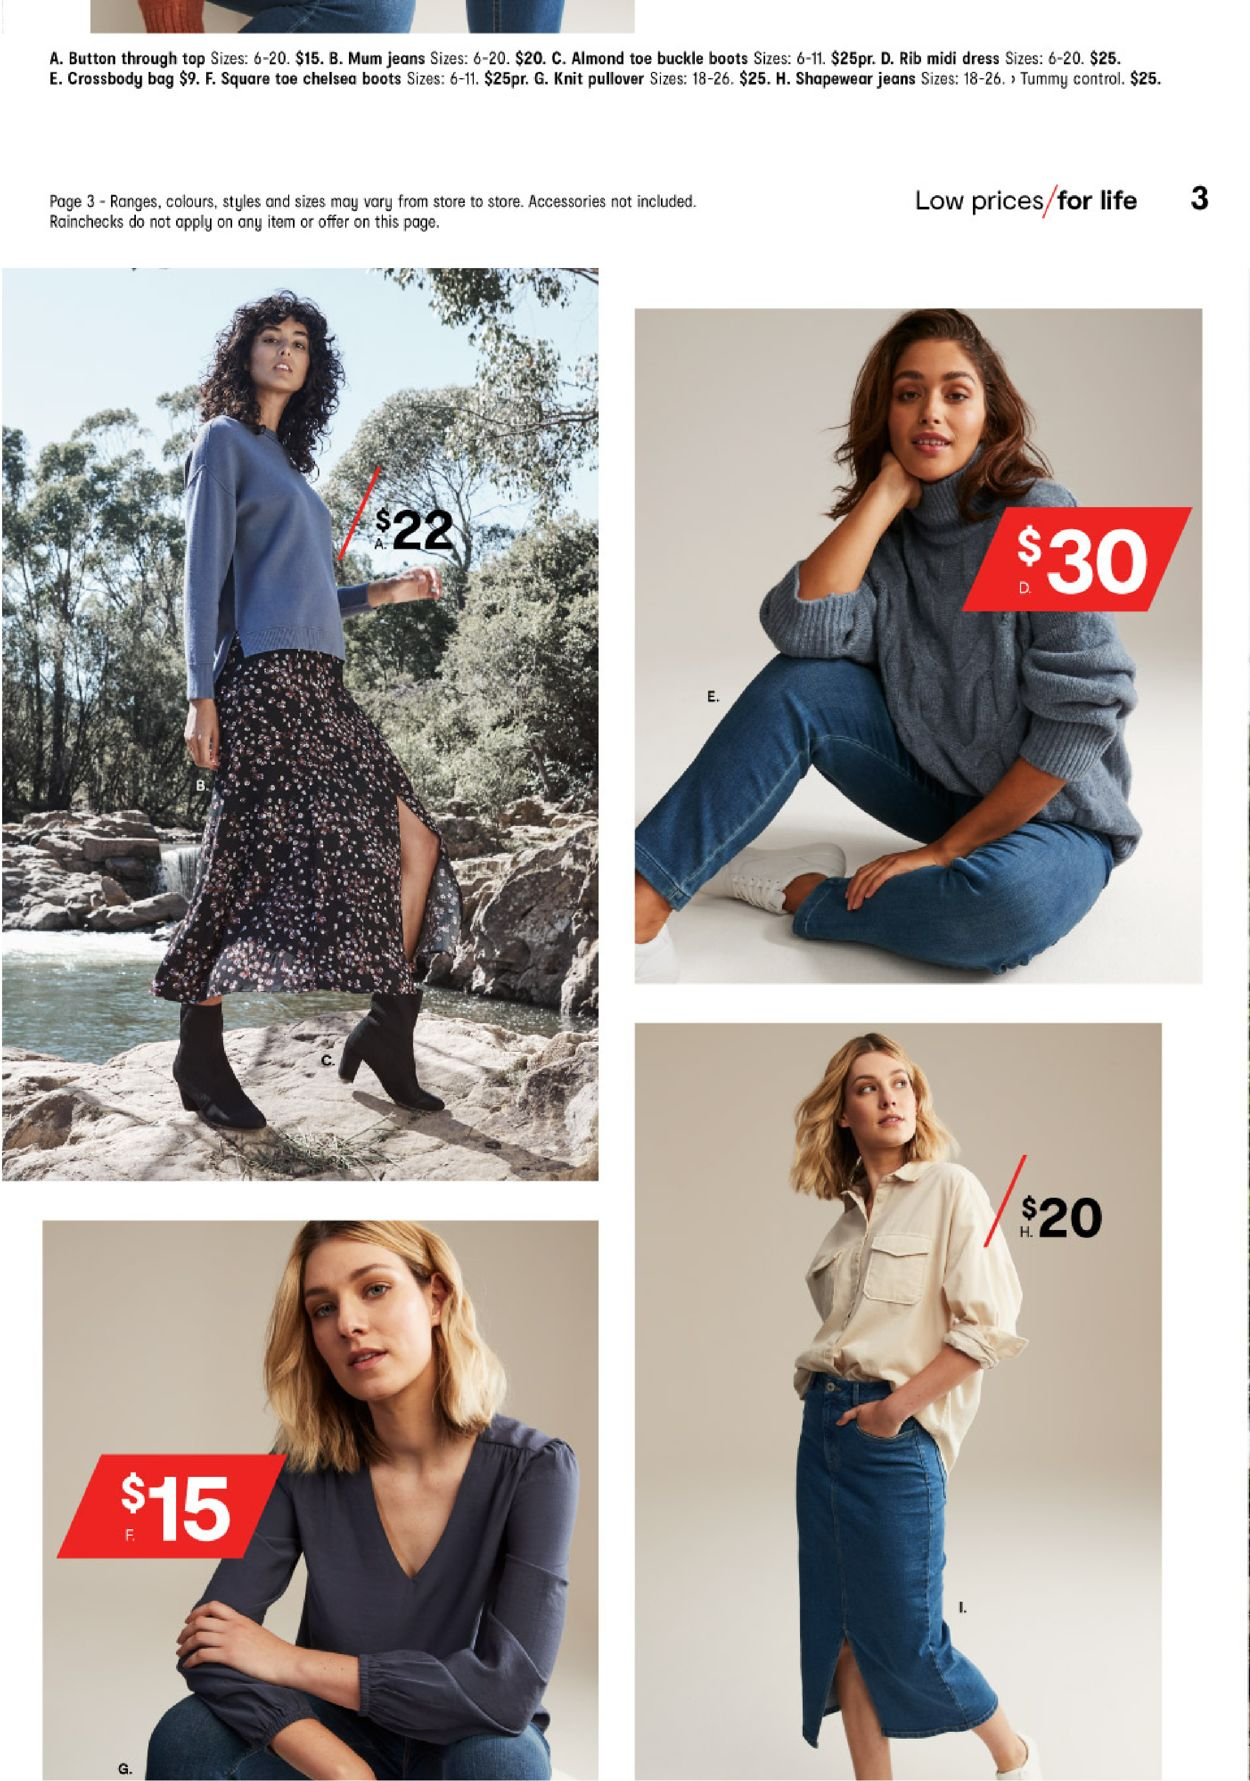 Kmart Catalogue - 22/04-12/05/2021 (Page 4)